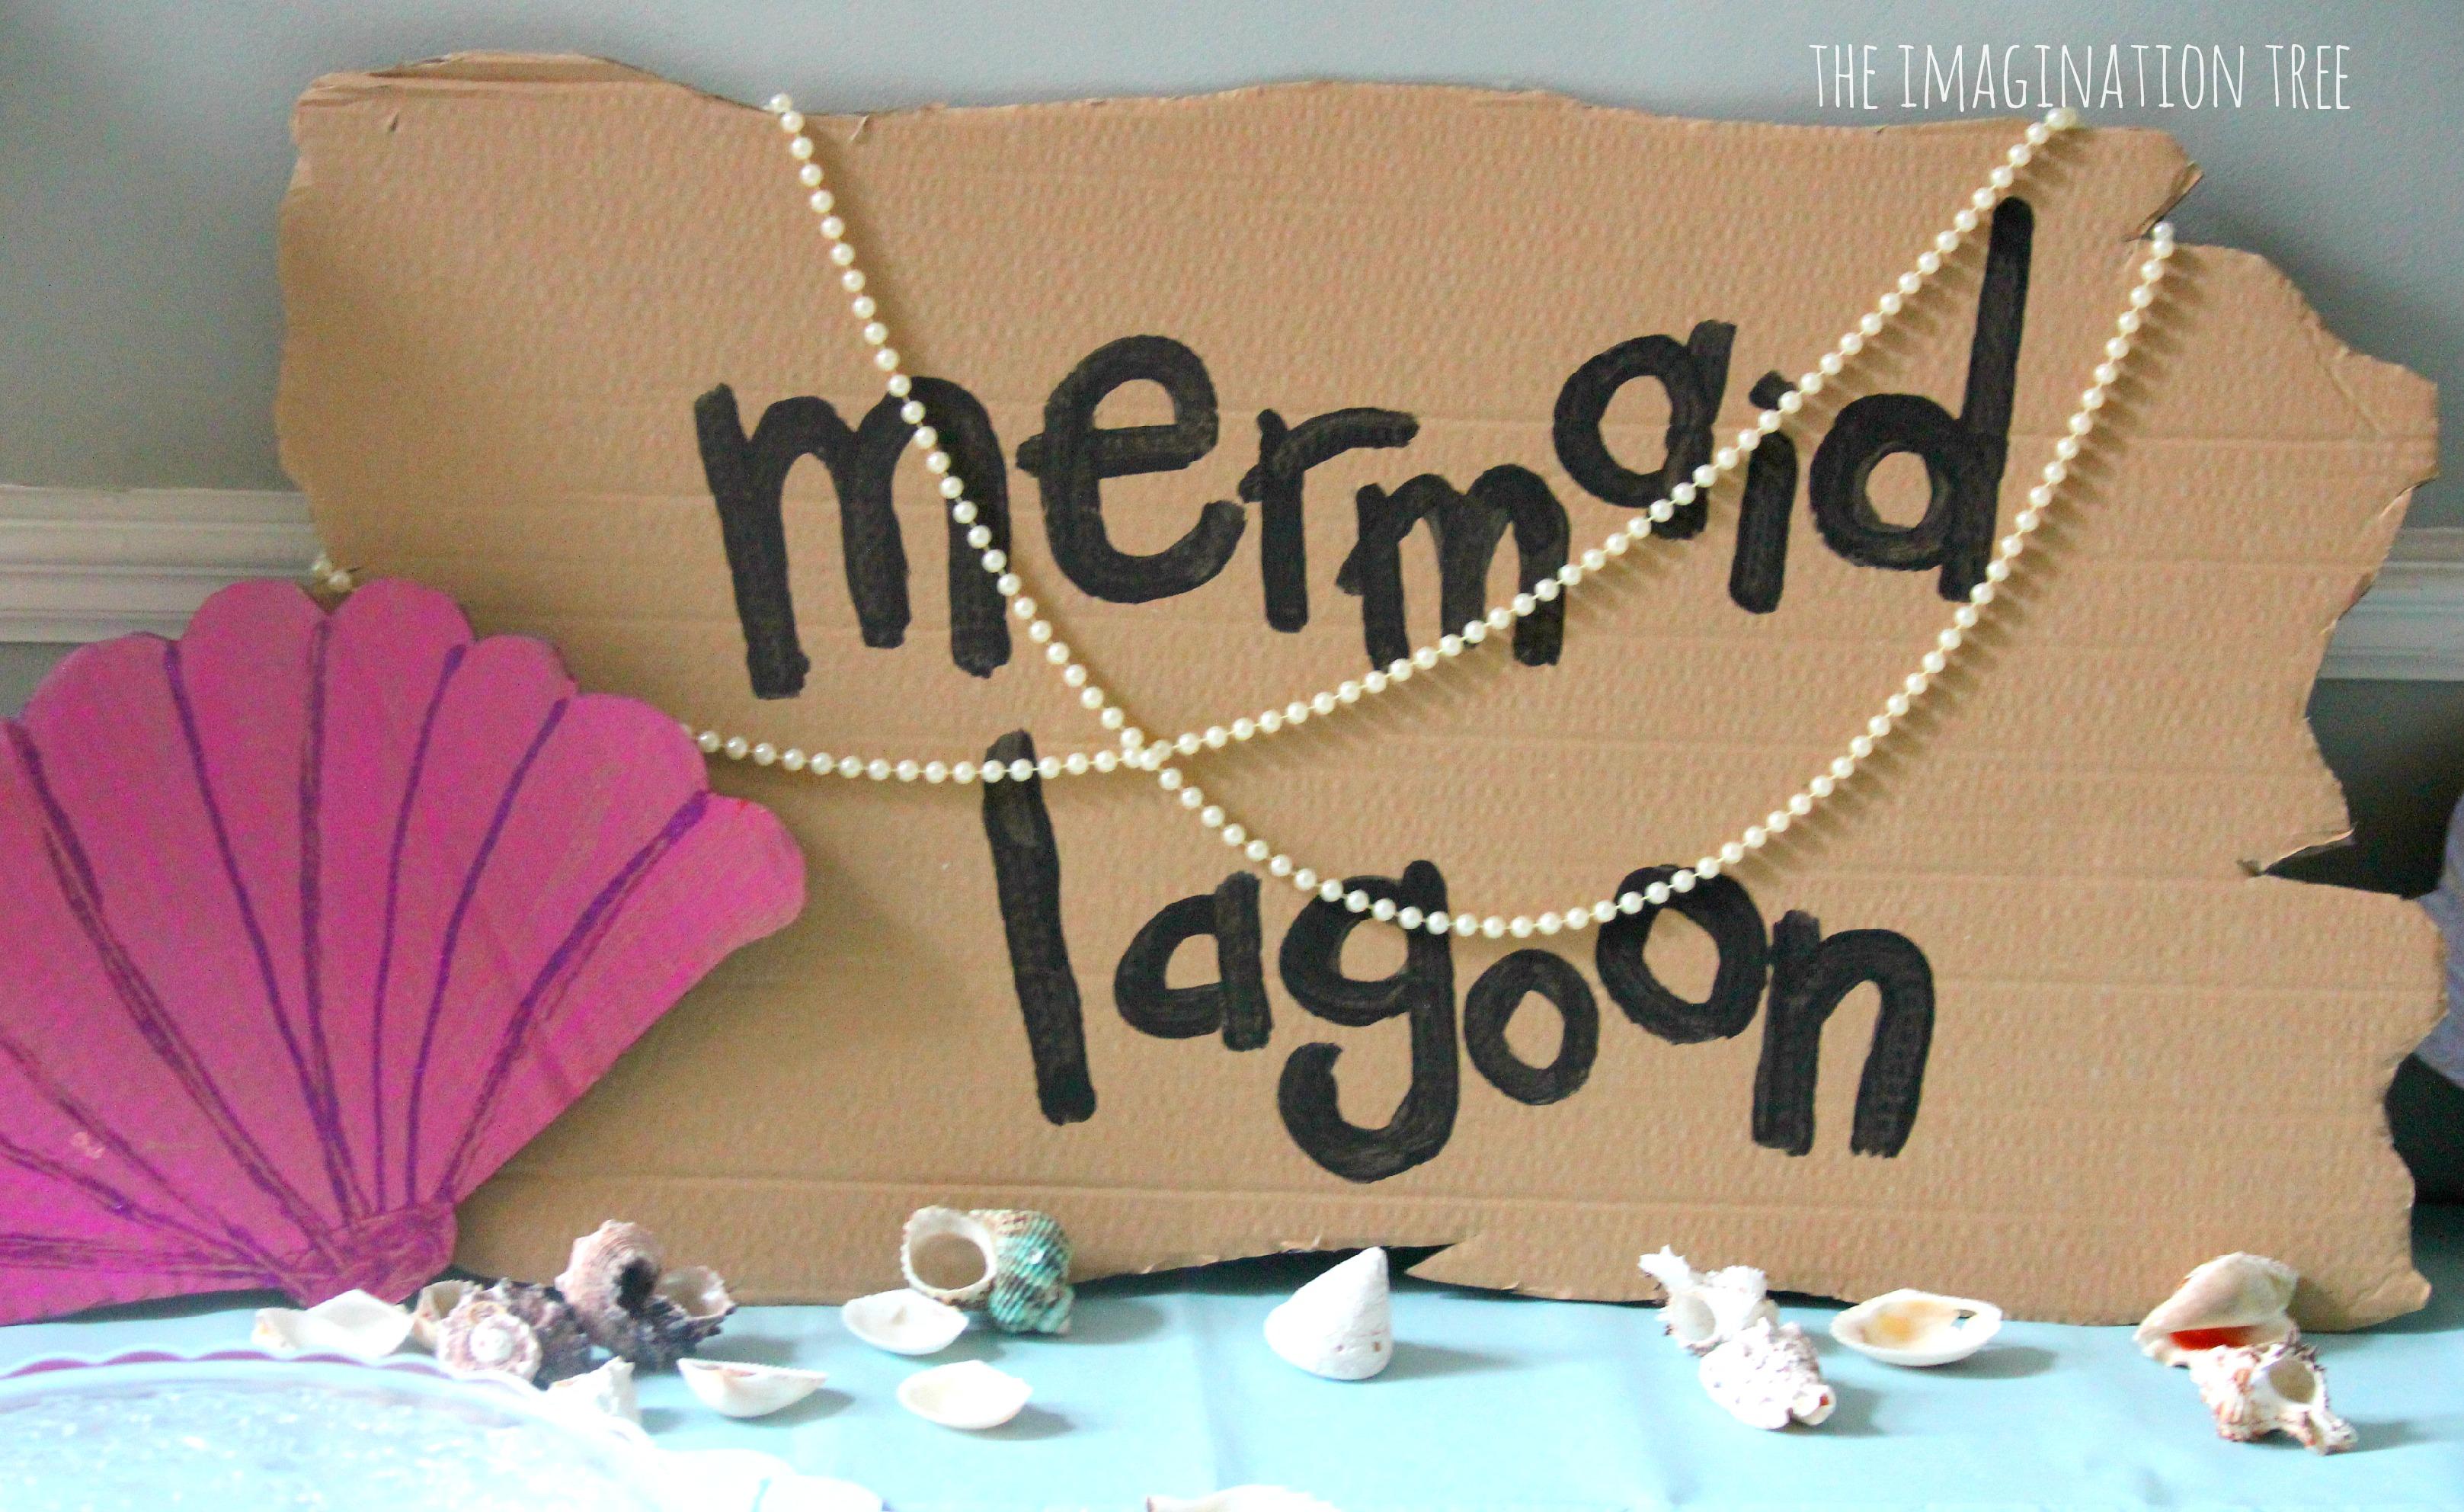 Mermaid Lagoon Party Sign